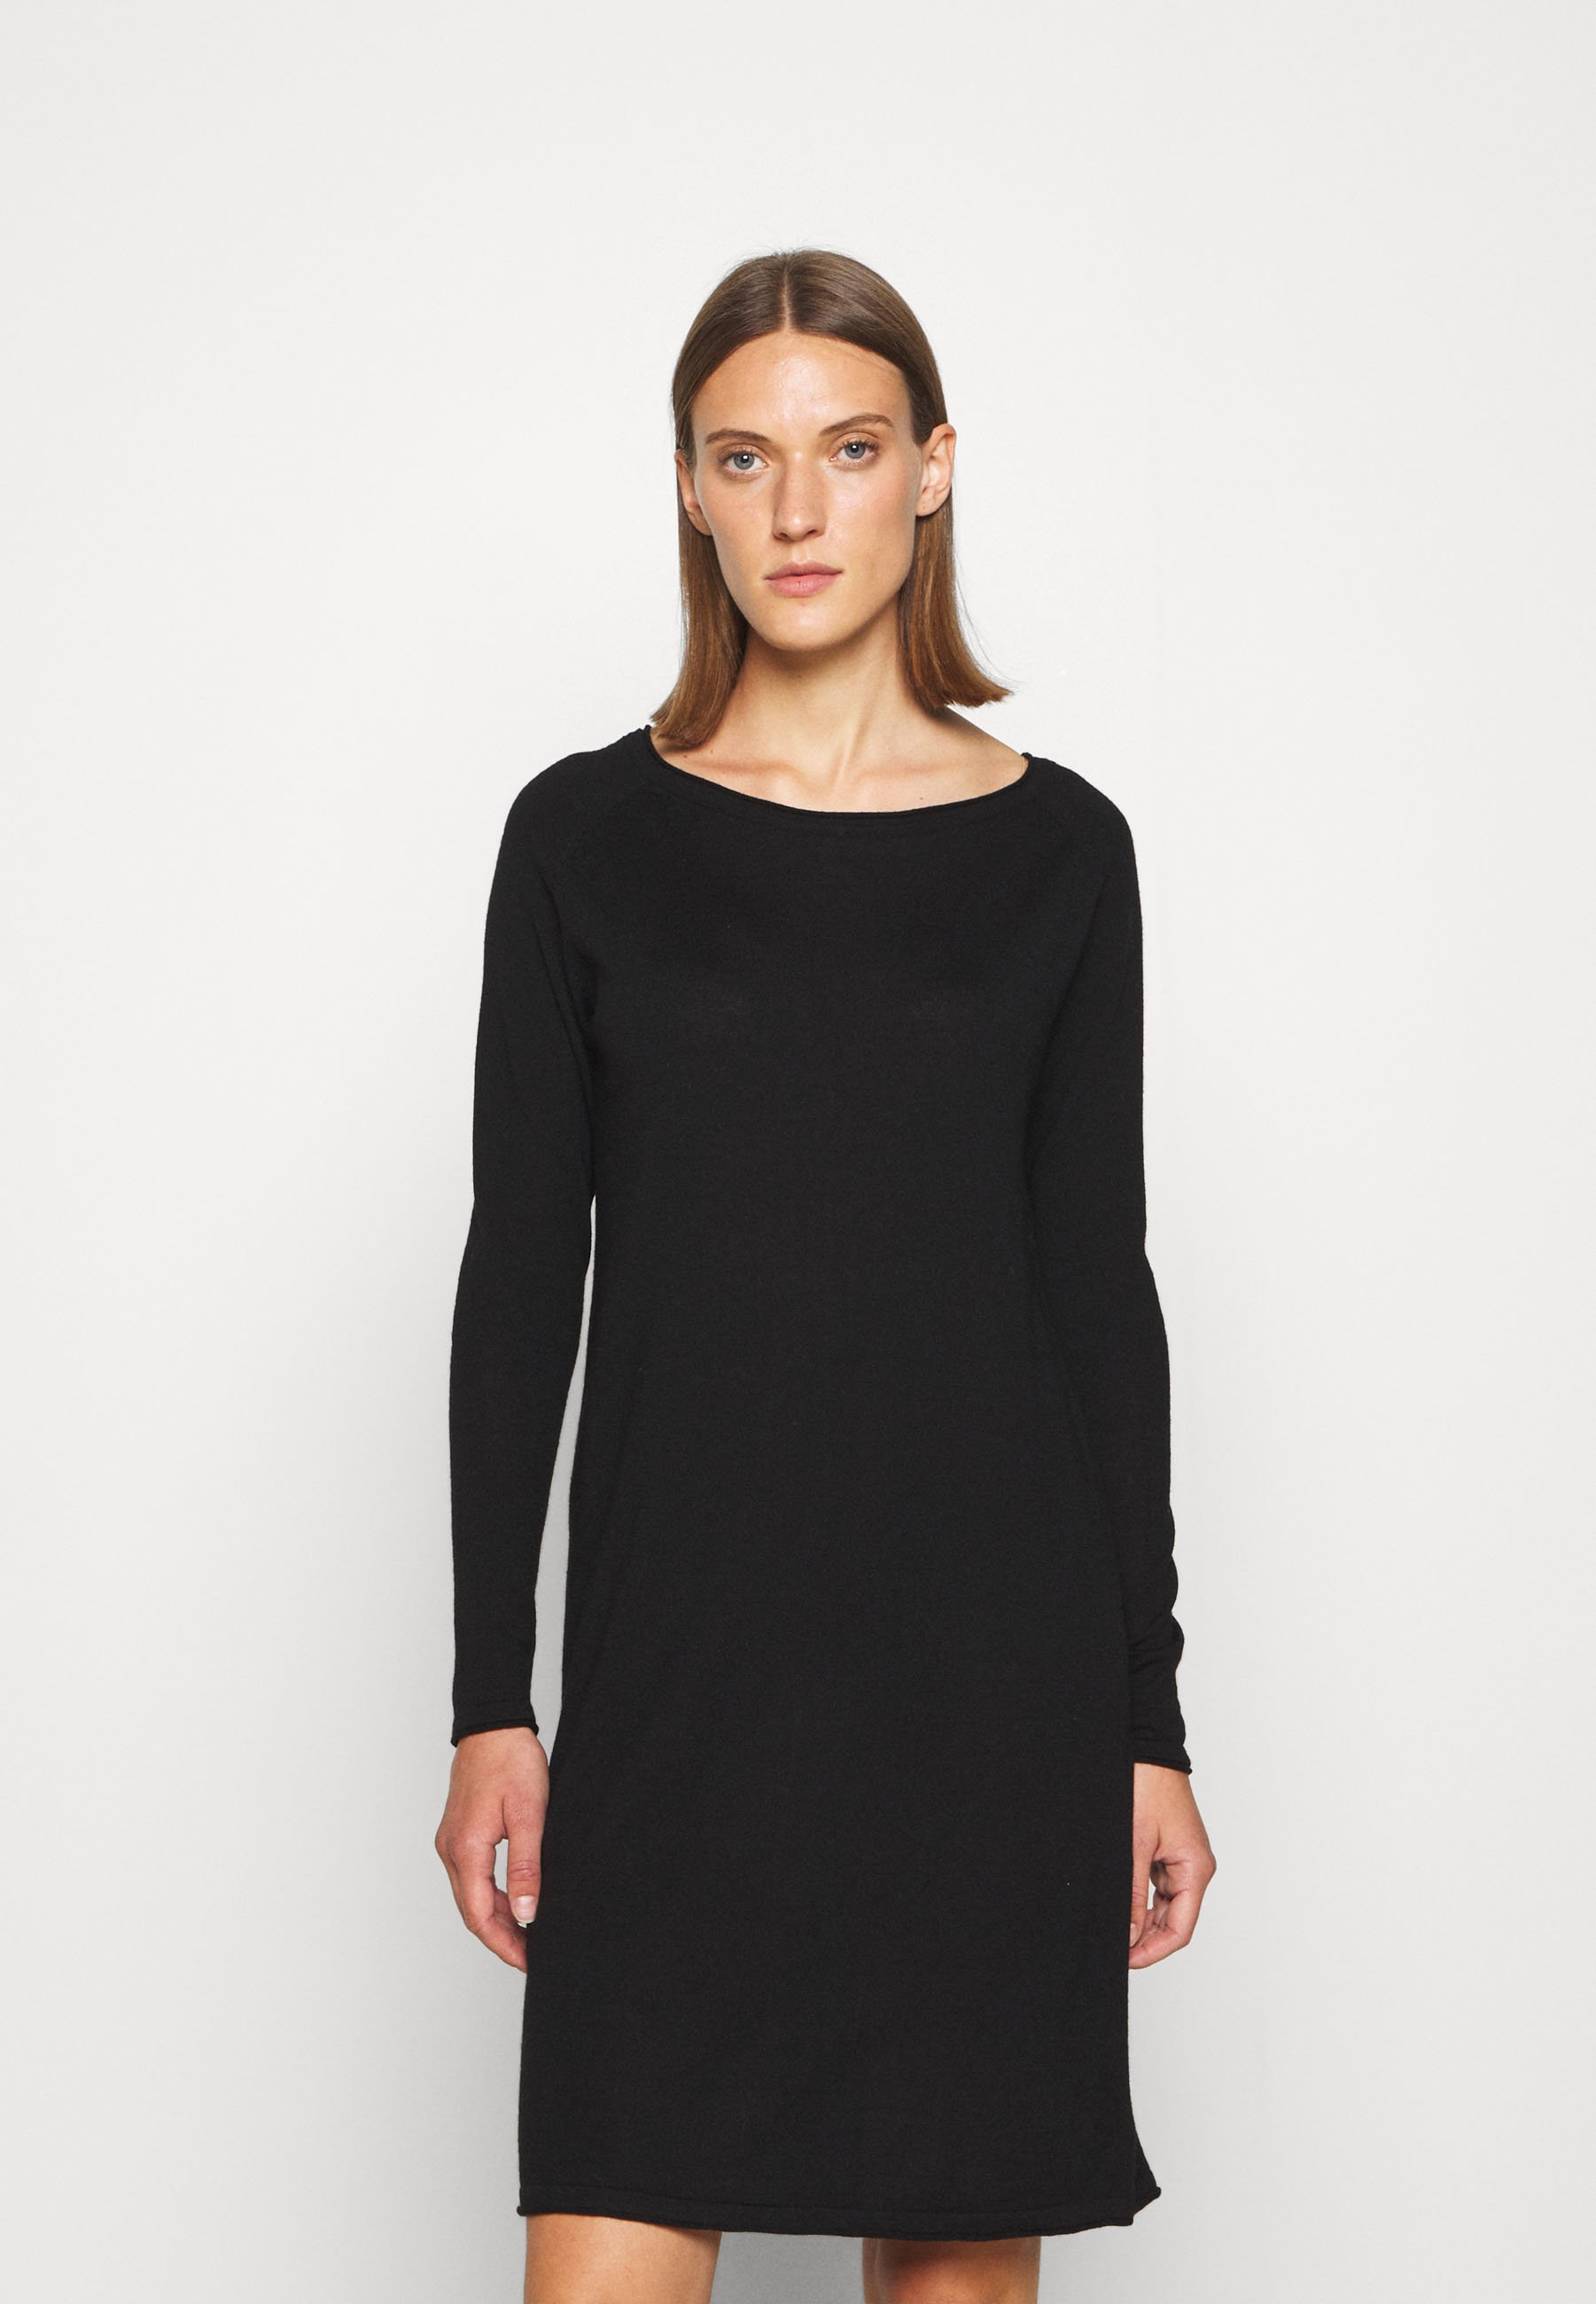 Femme FELLINI MARIKE - Robe pull